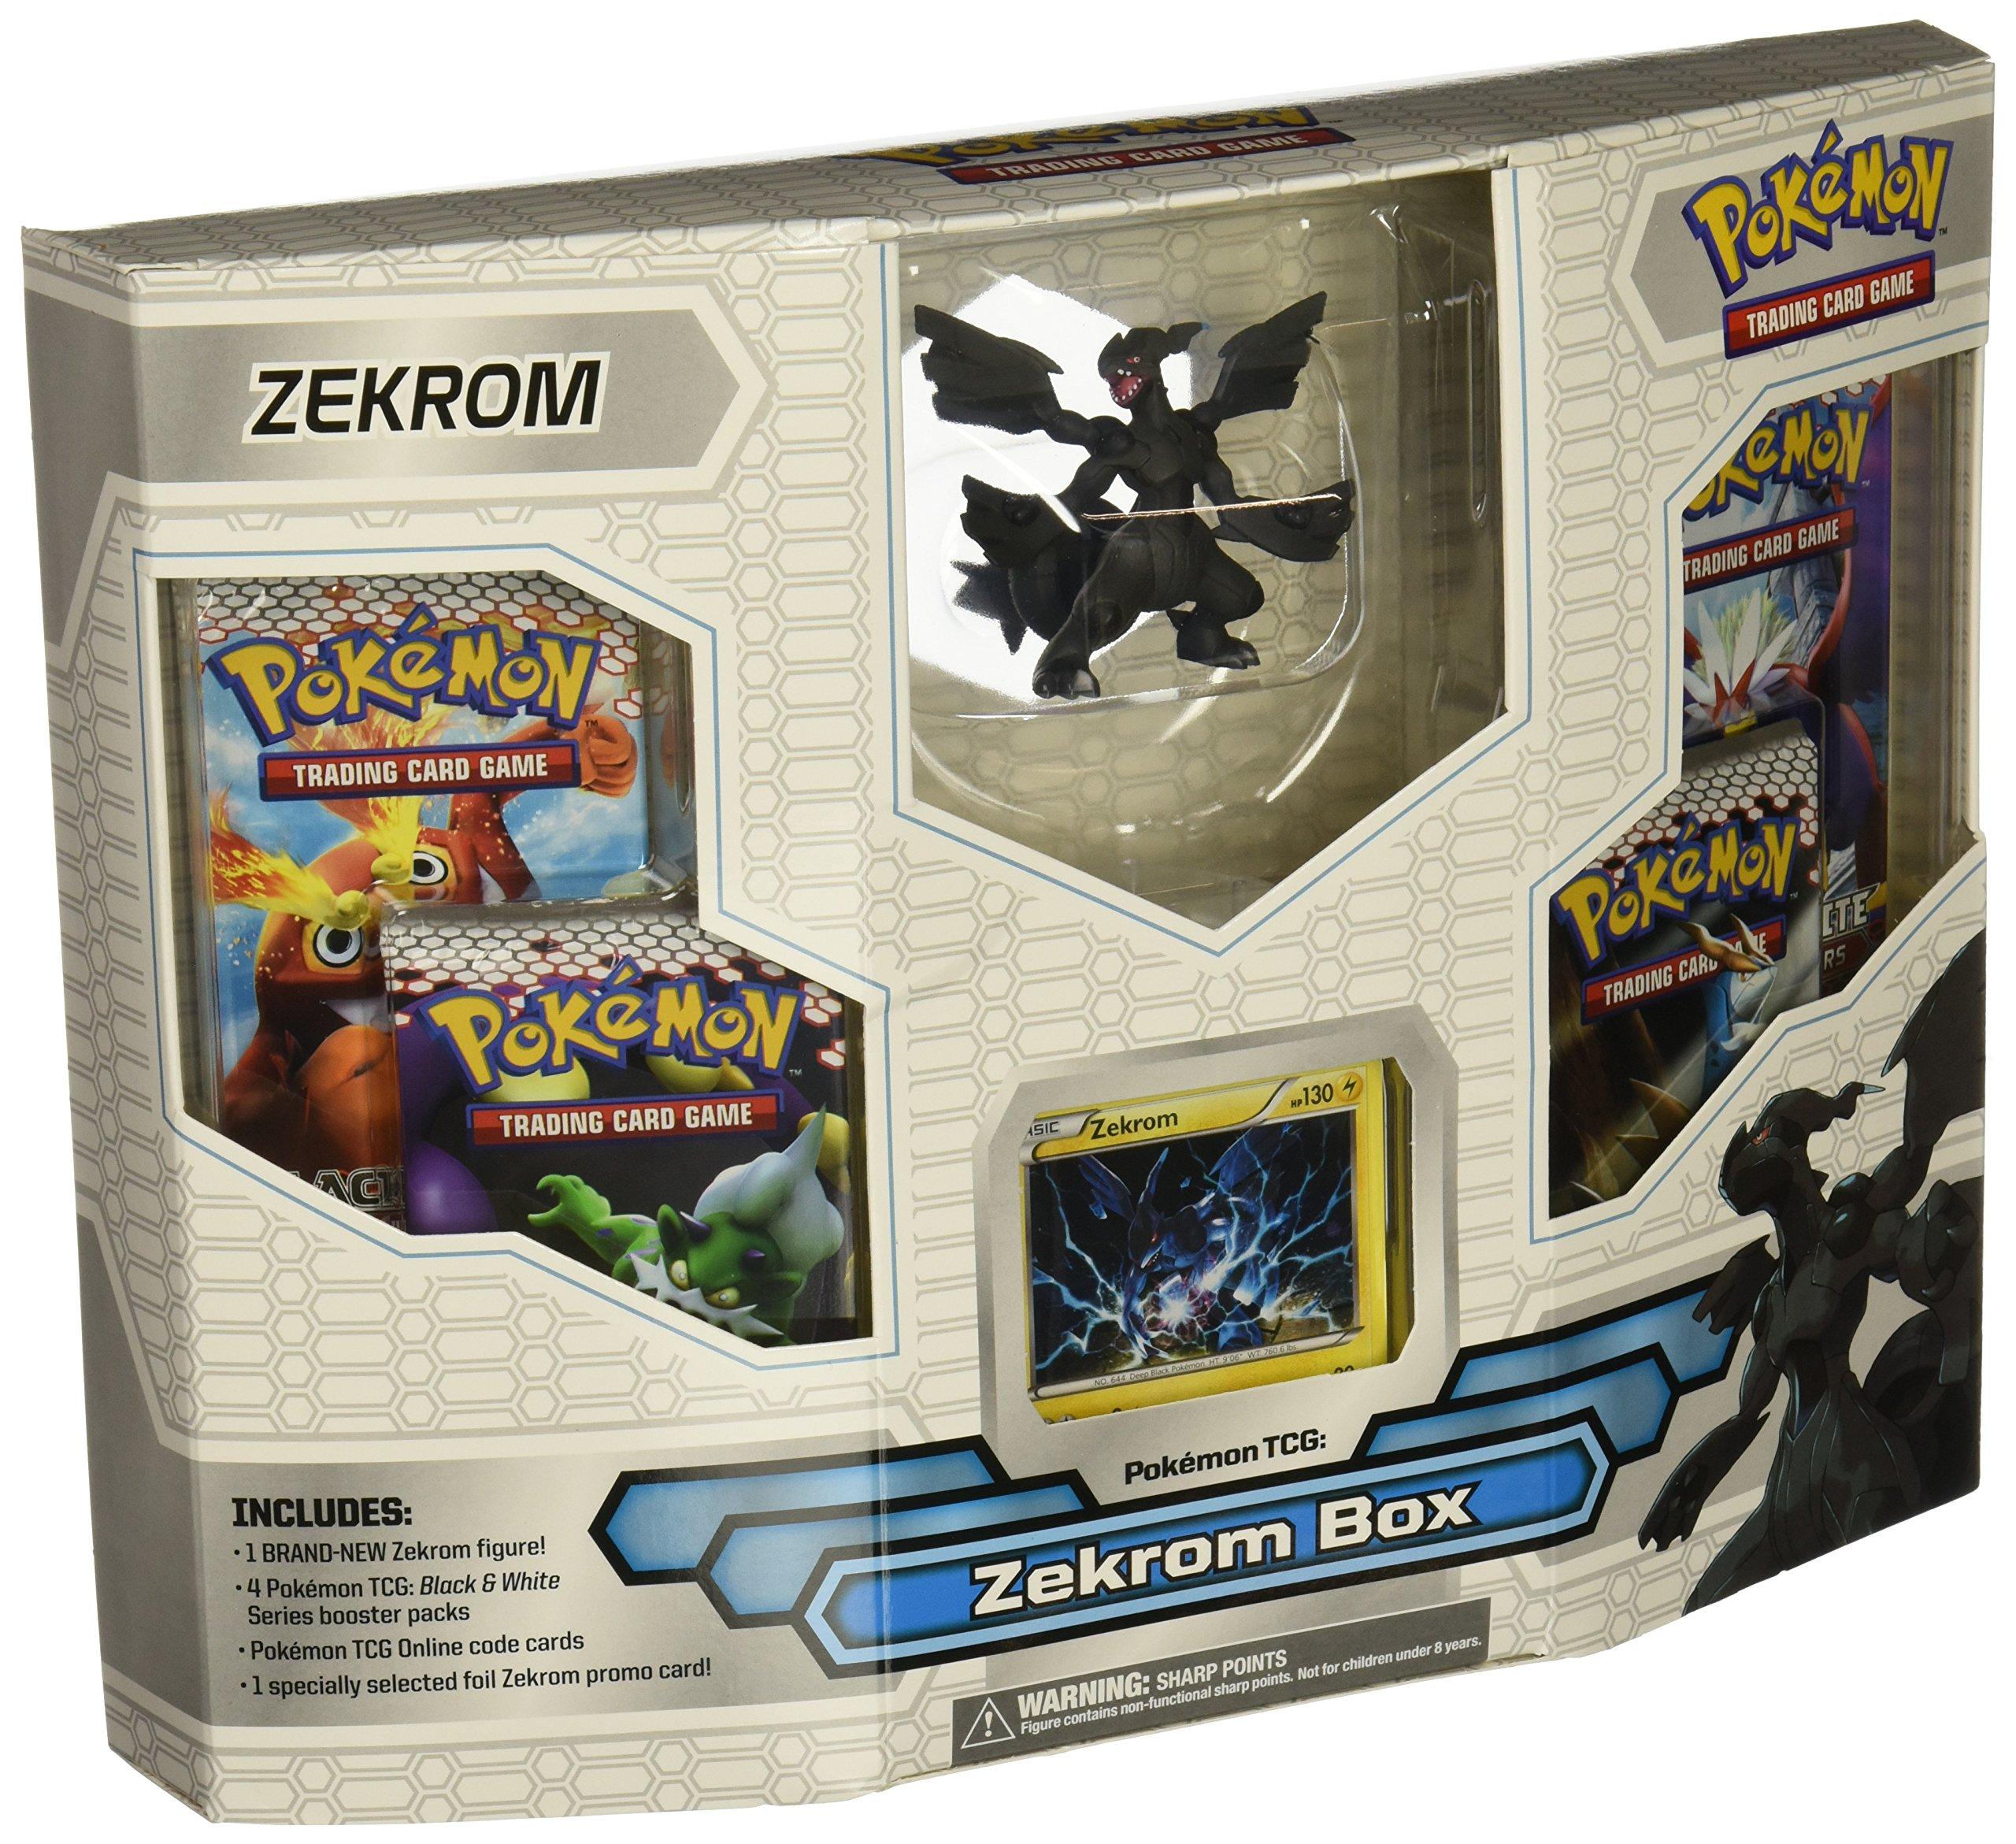 Pokemon Black White Card Game ZEKROM Box 4 Booster Packs, 1 Holo Promo Card 1...: Amazon.es: Juguetes y juegos